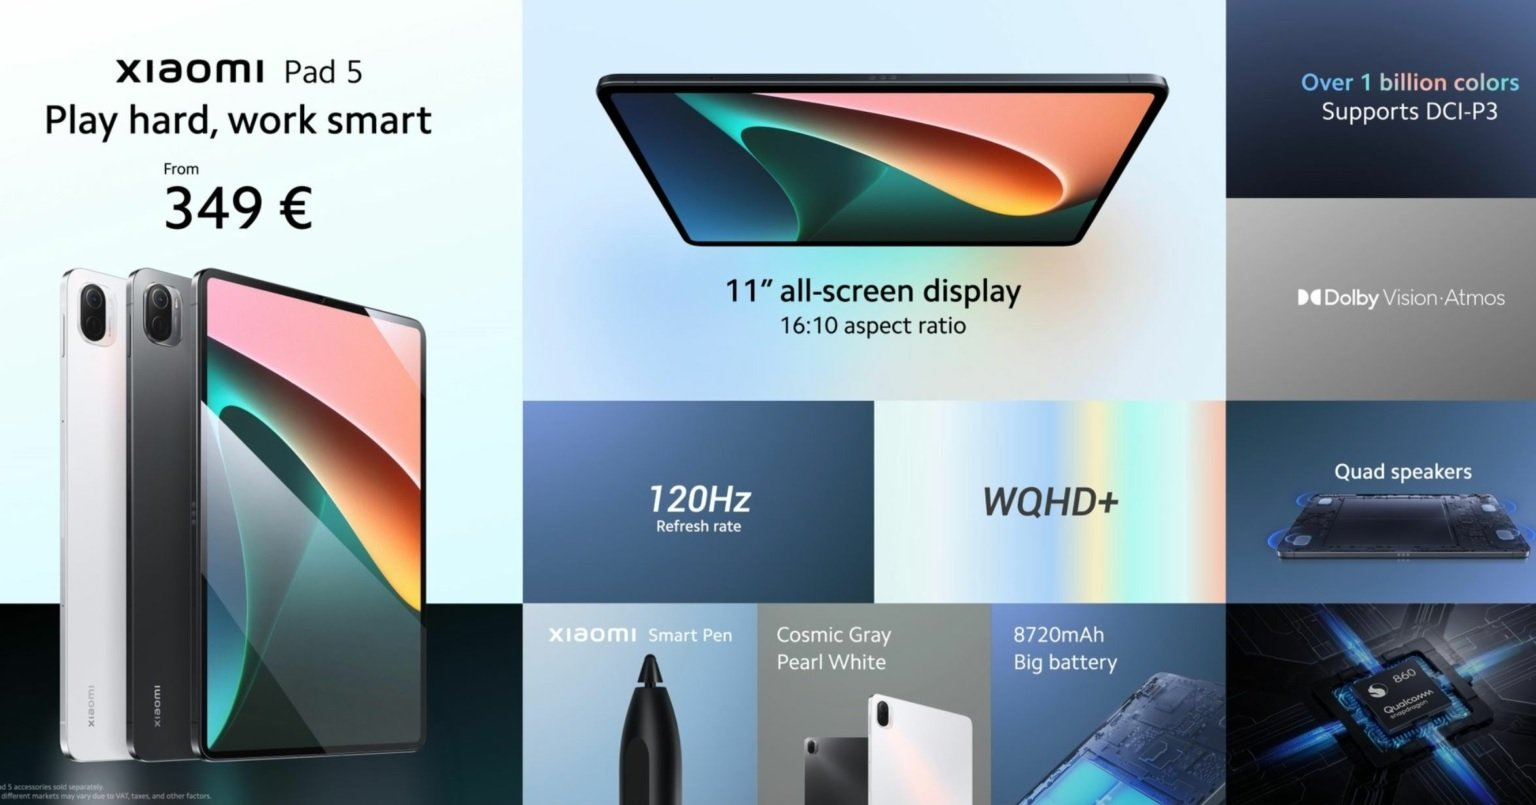 "xiaomi-pad-5-vorgestellt:-das-""ipad-pro""-als-gunstiges-android-tablet"